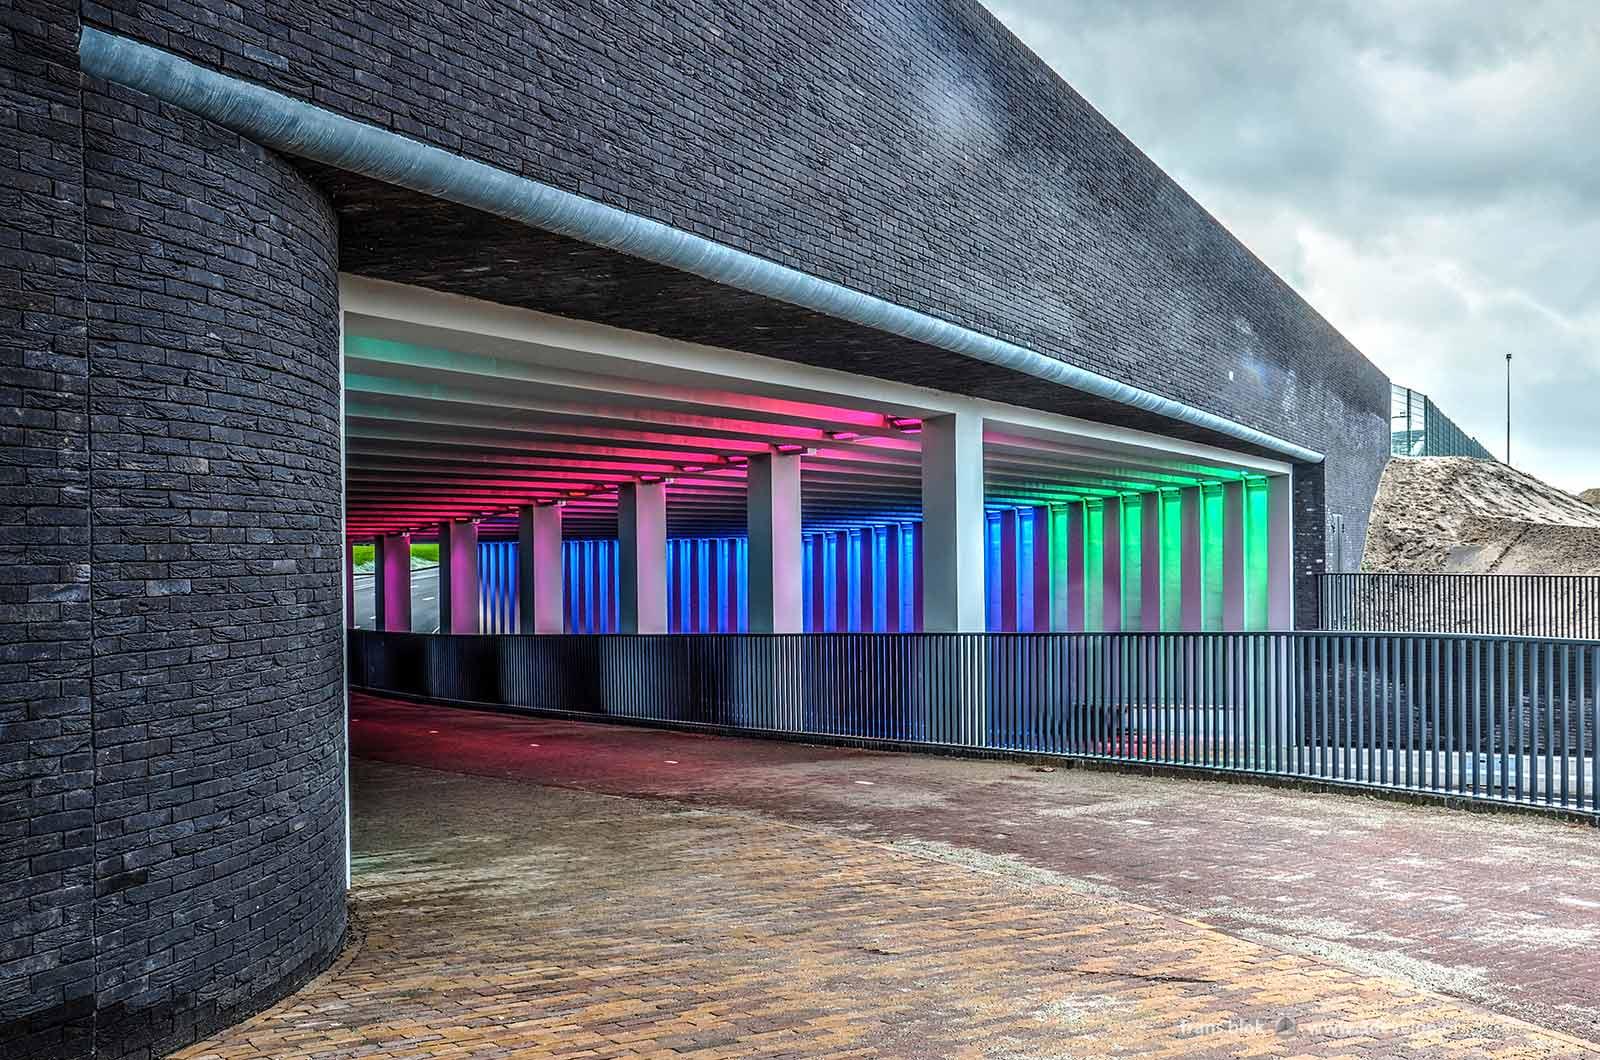 Photo of the Marstunnel in Zutphen looking from Noorderhaven and De Mars towards the city center